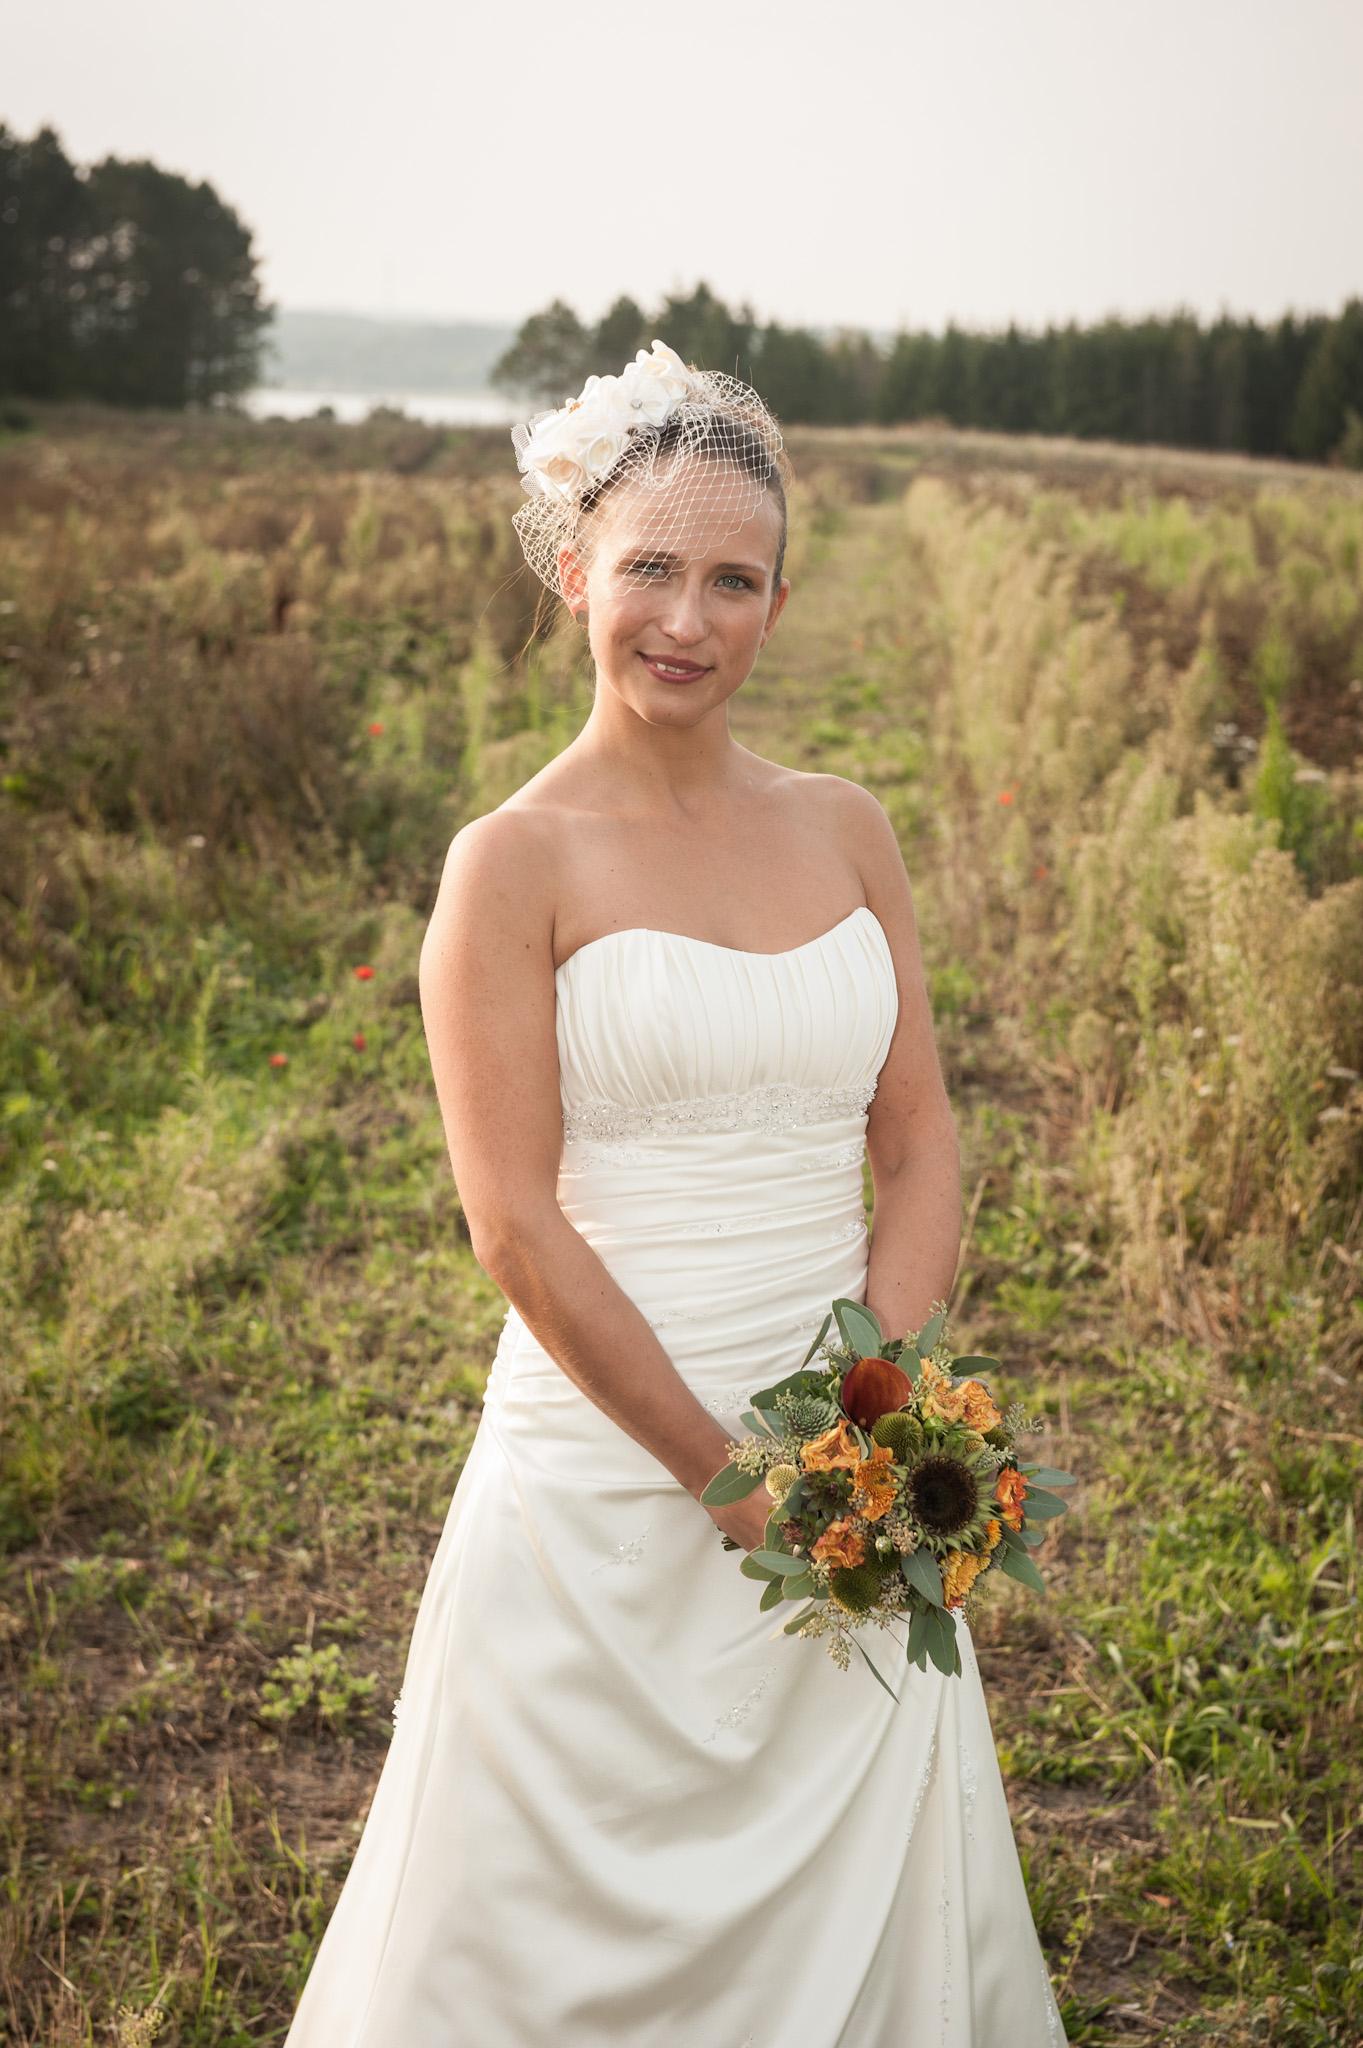 Bryllup_Vibeke_Pedersen_39